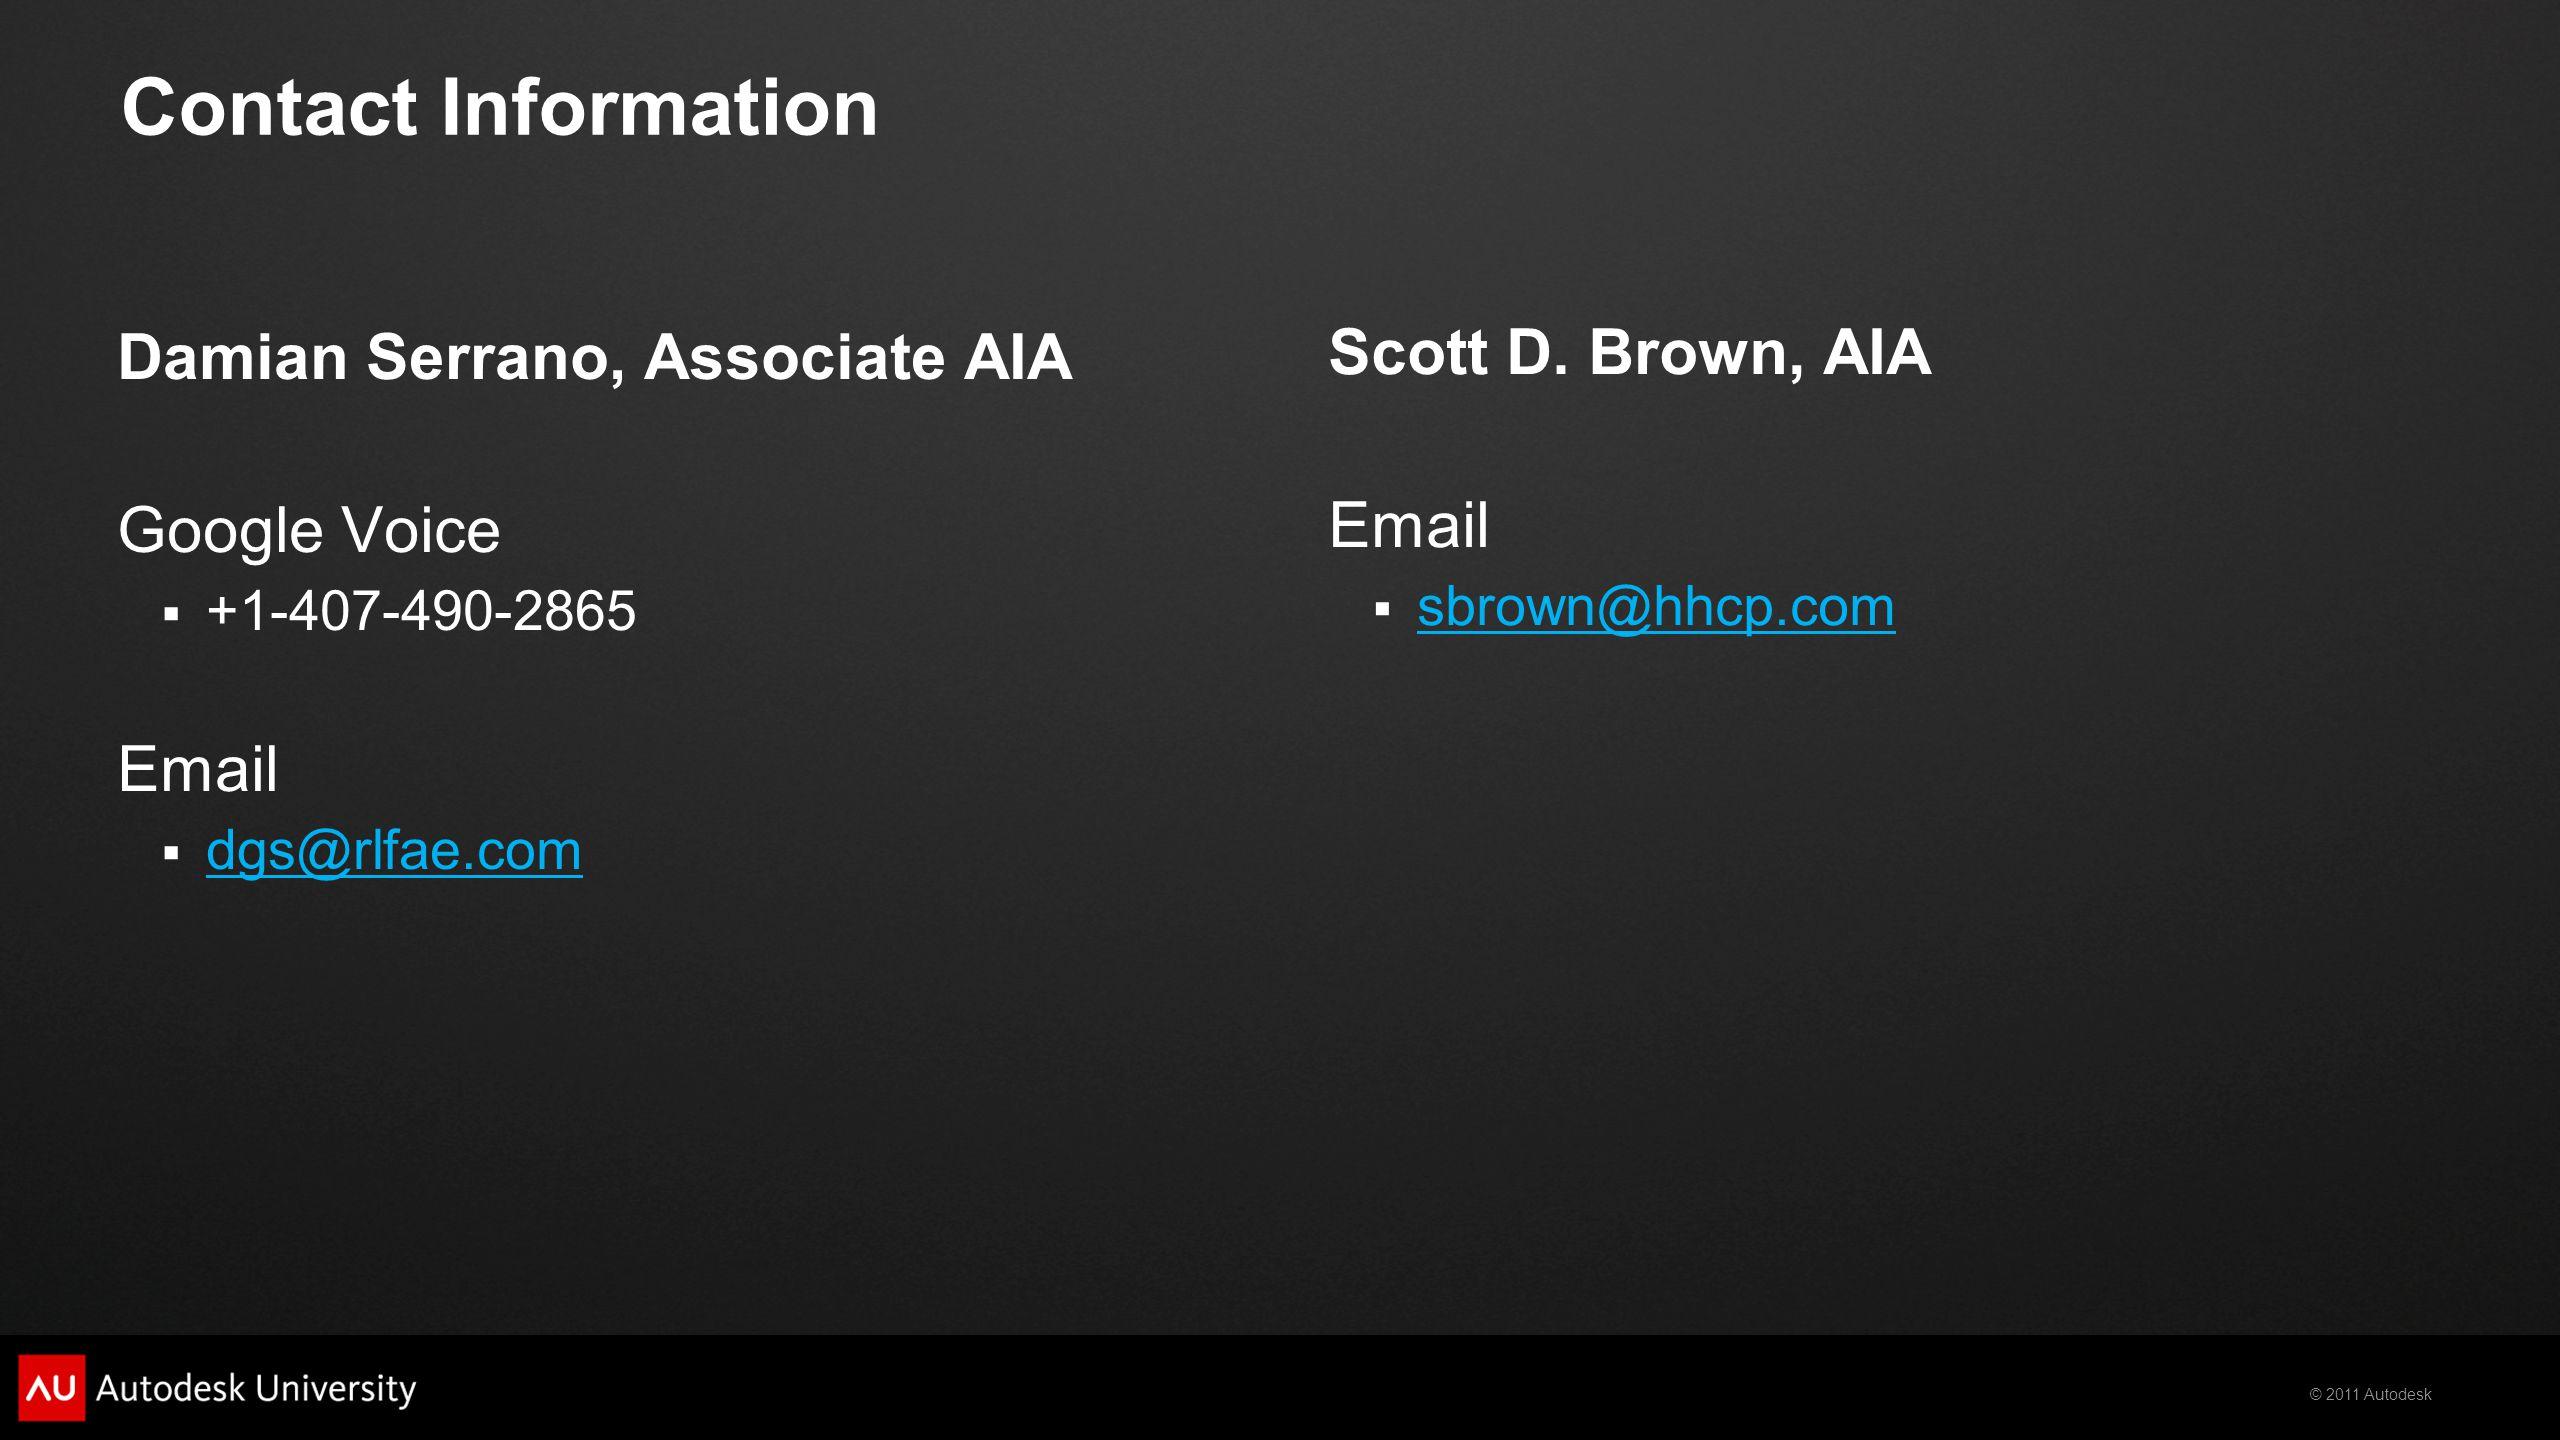 Contact Information Damian Serrano, Associate AIA. Google Voice. +1-407-490-2865. Email. dgs@rlfae.com.